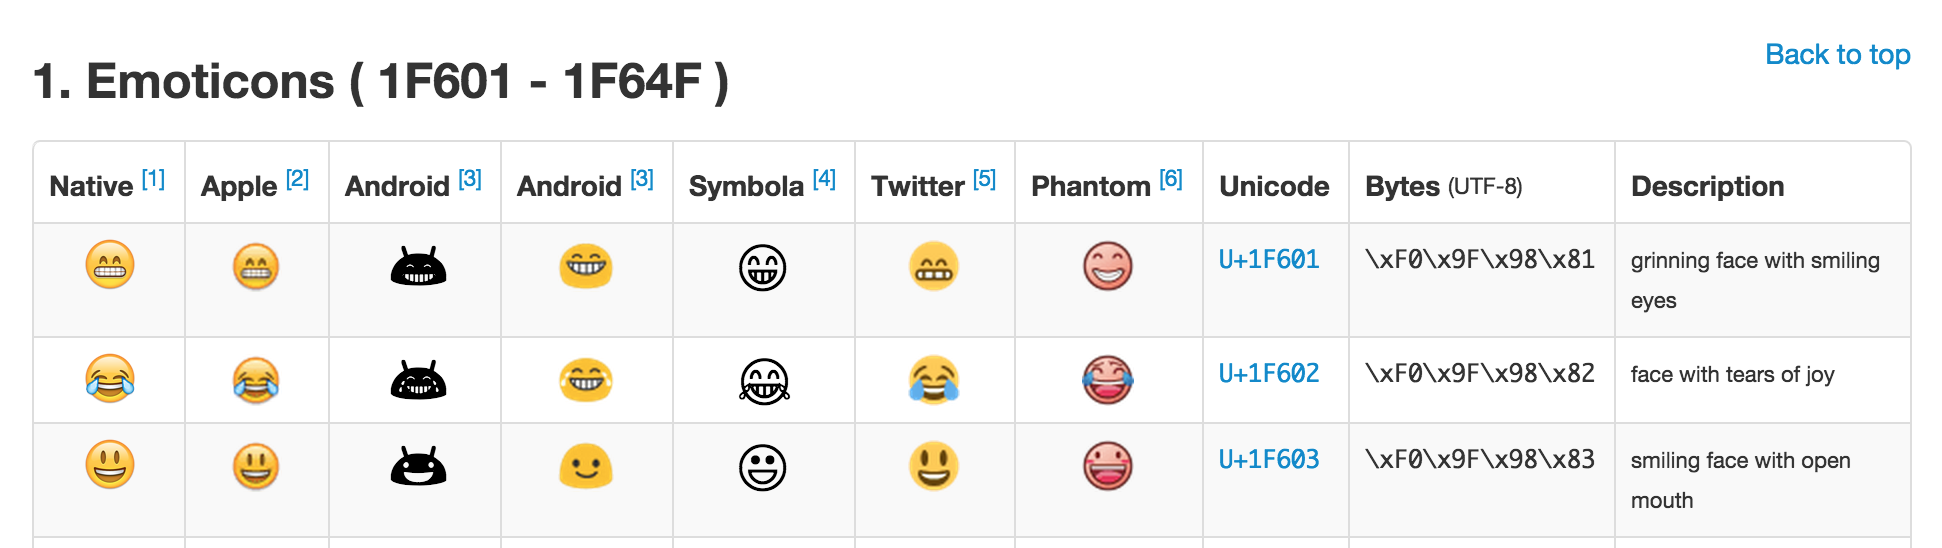 Emoji Toggles! | CSS-Tricks